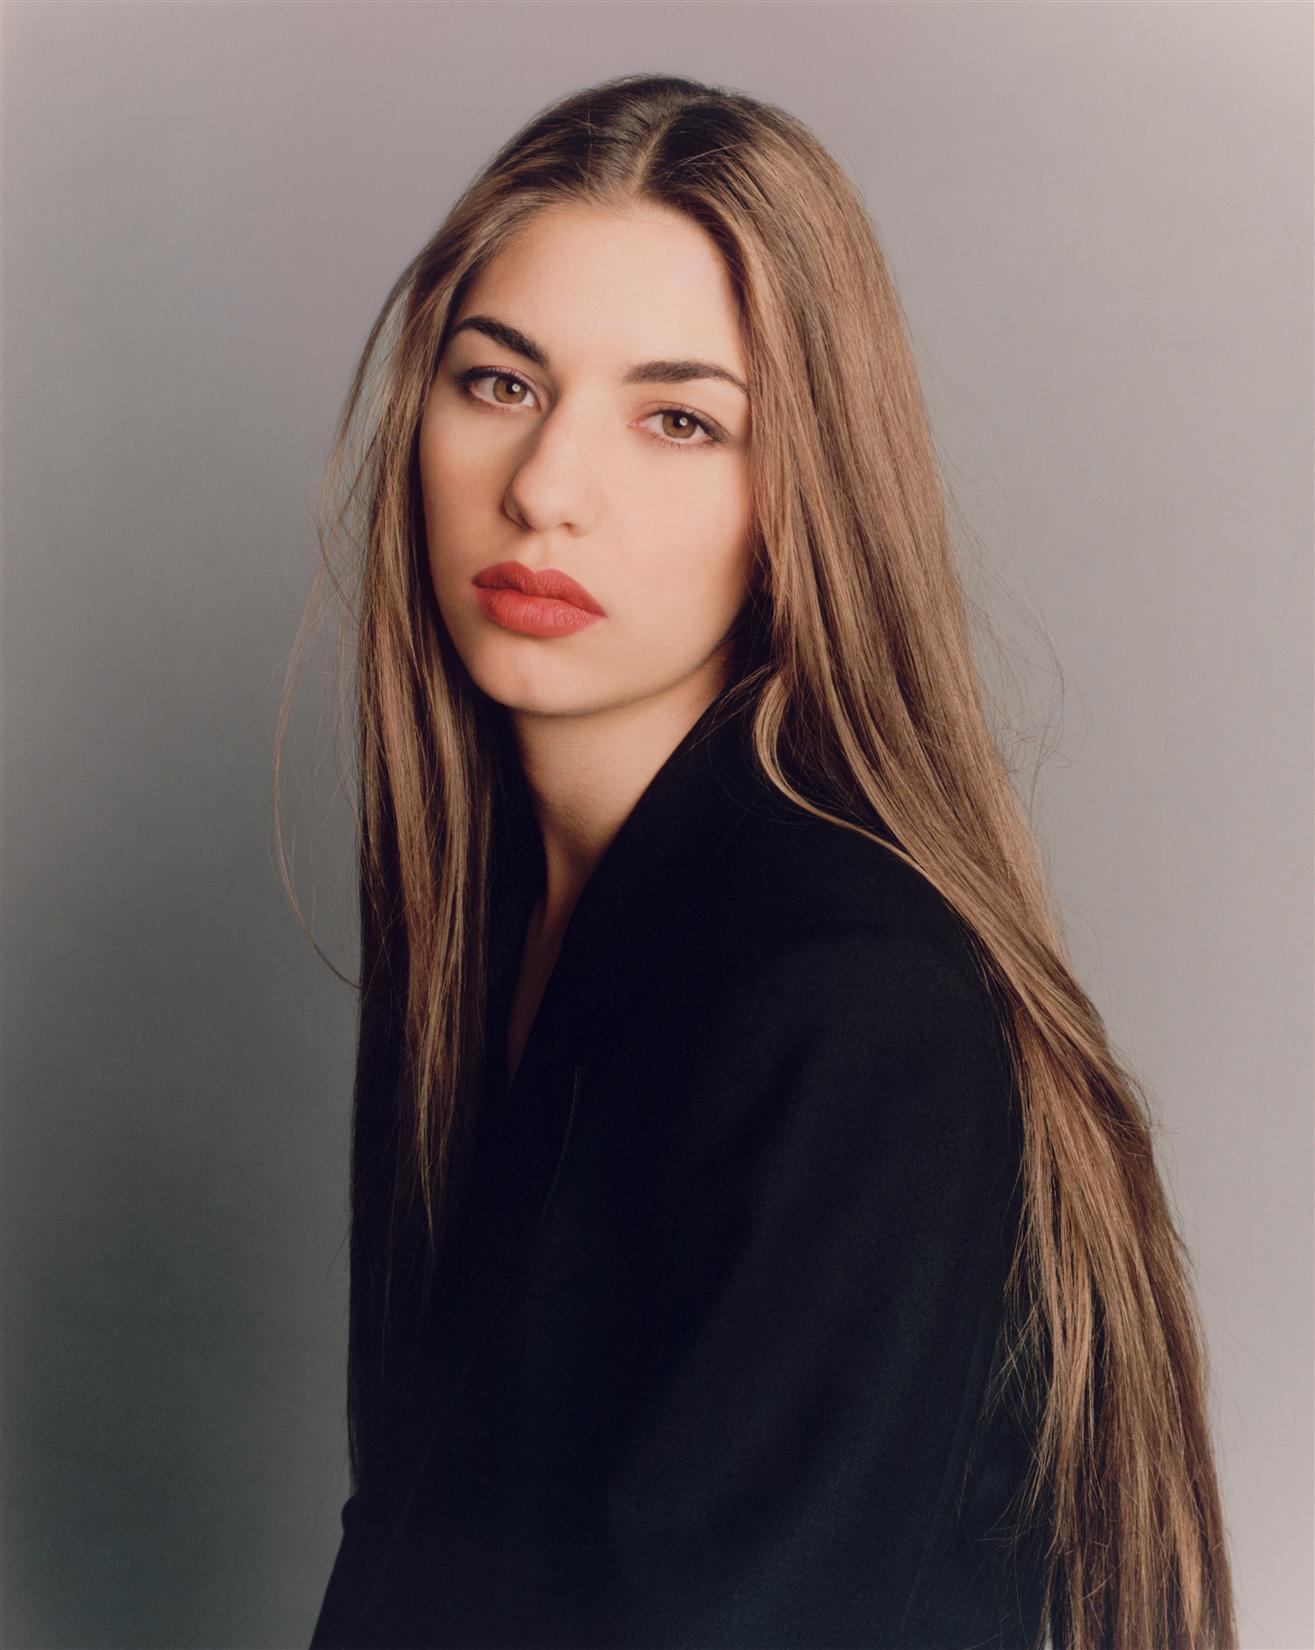 Sofia Coppola's Soundtrack - The Music from Sofia Coppola's Films